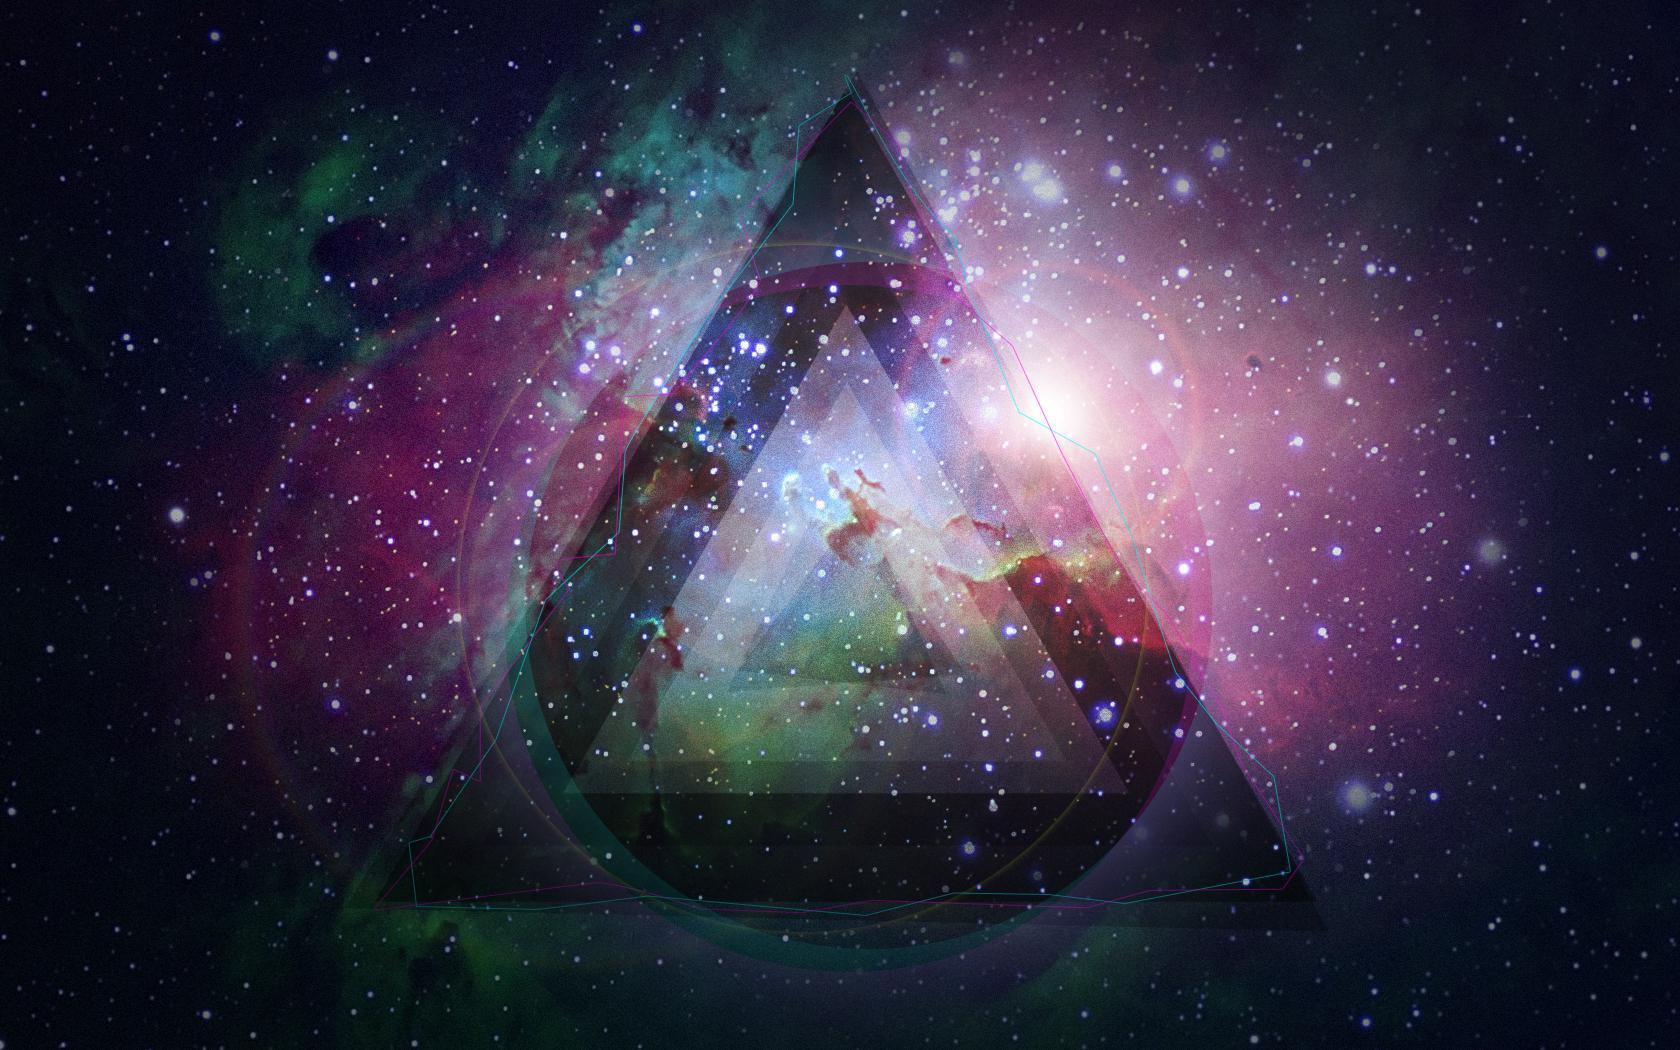 symbolism of triangle